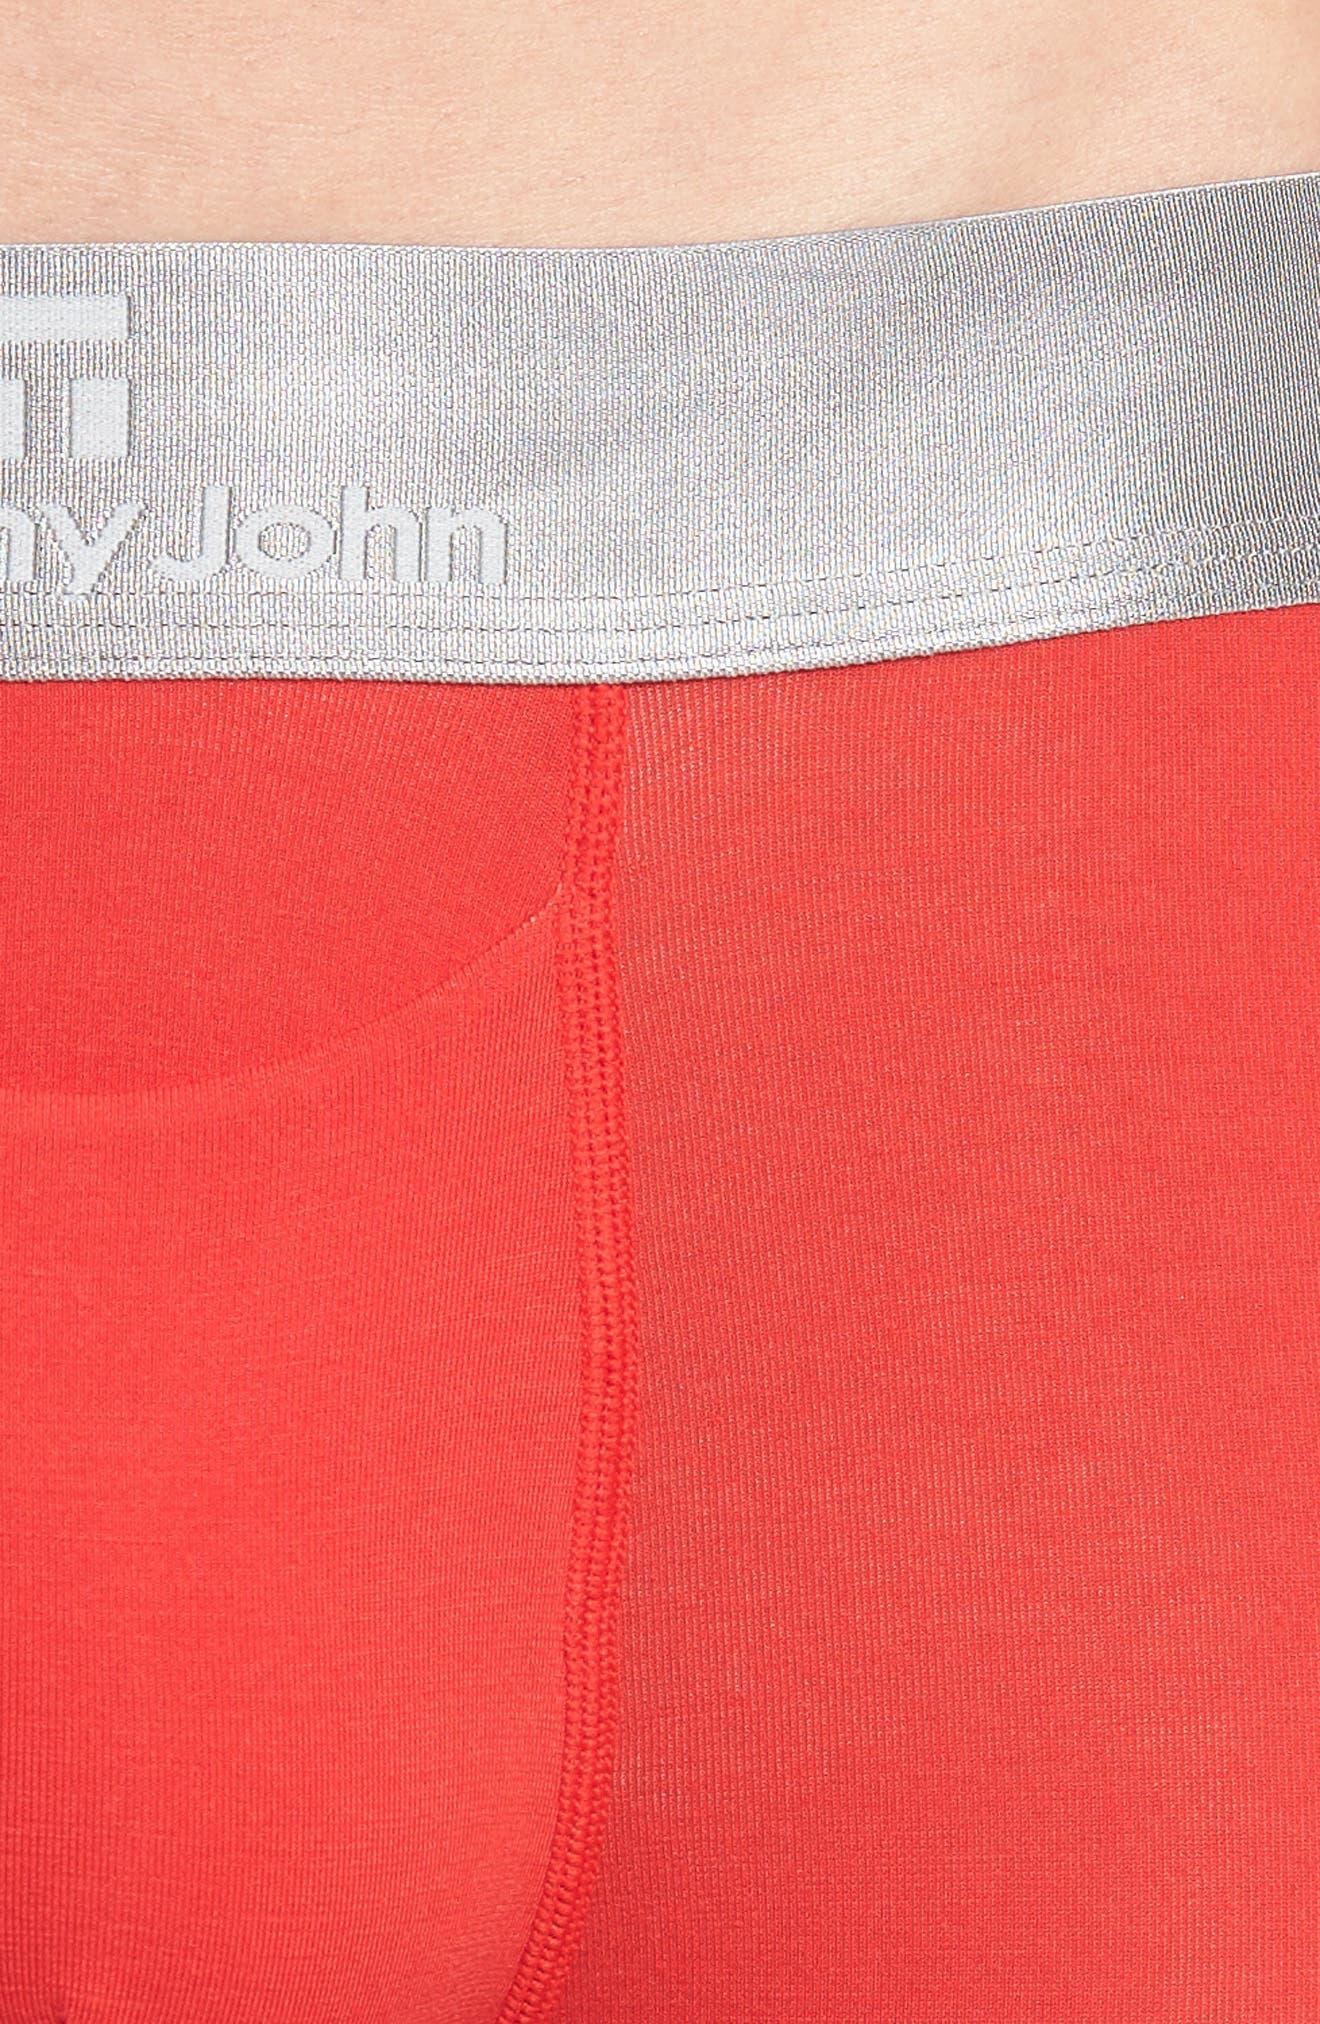 Second Skin Trunks,                             Alternate thumbnail 4, color,                             True Red/ Dress Blue